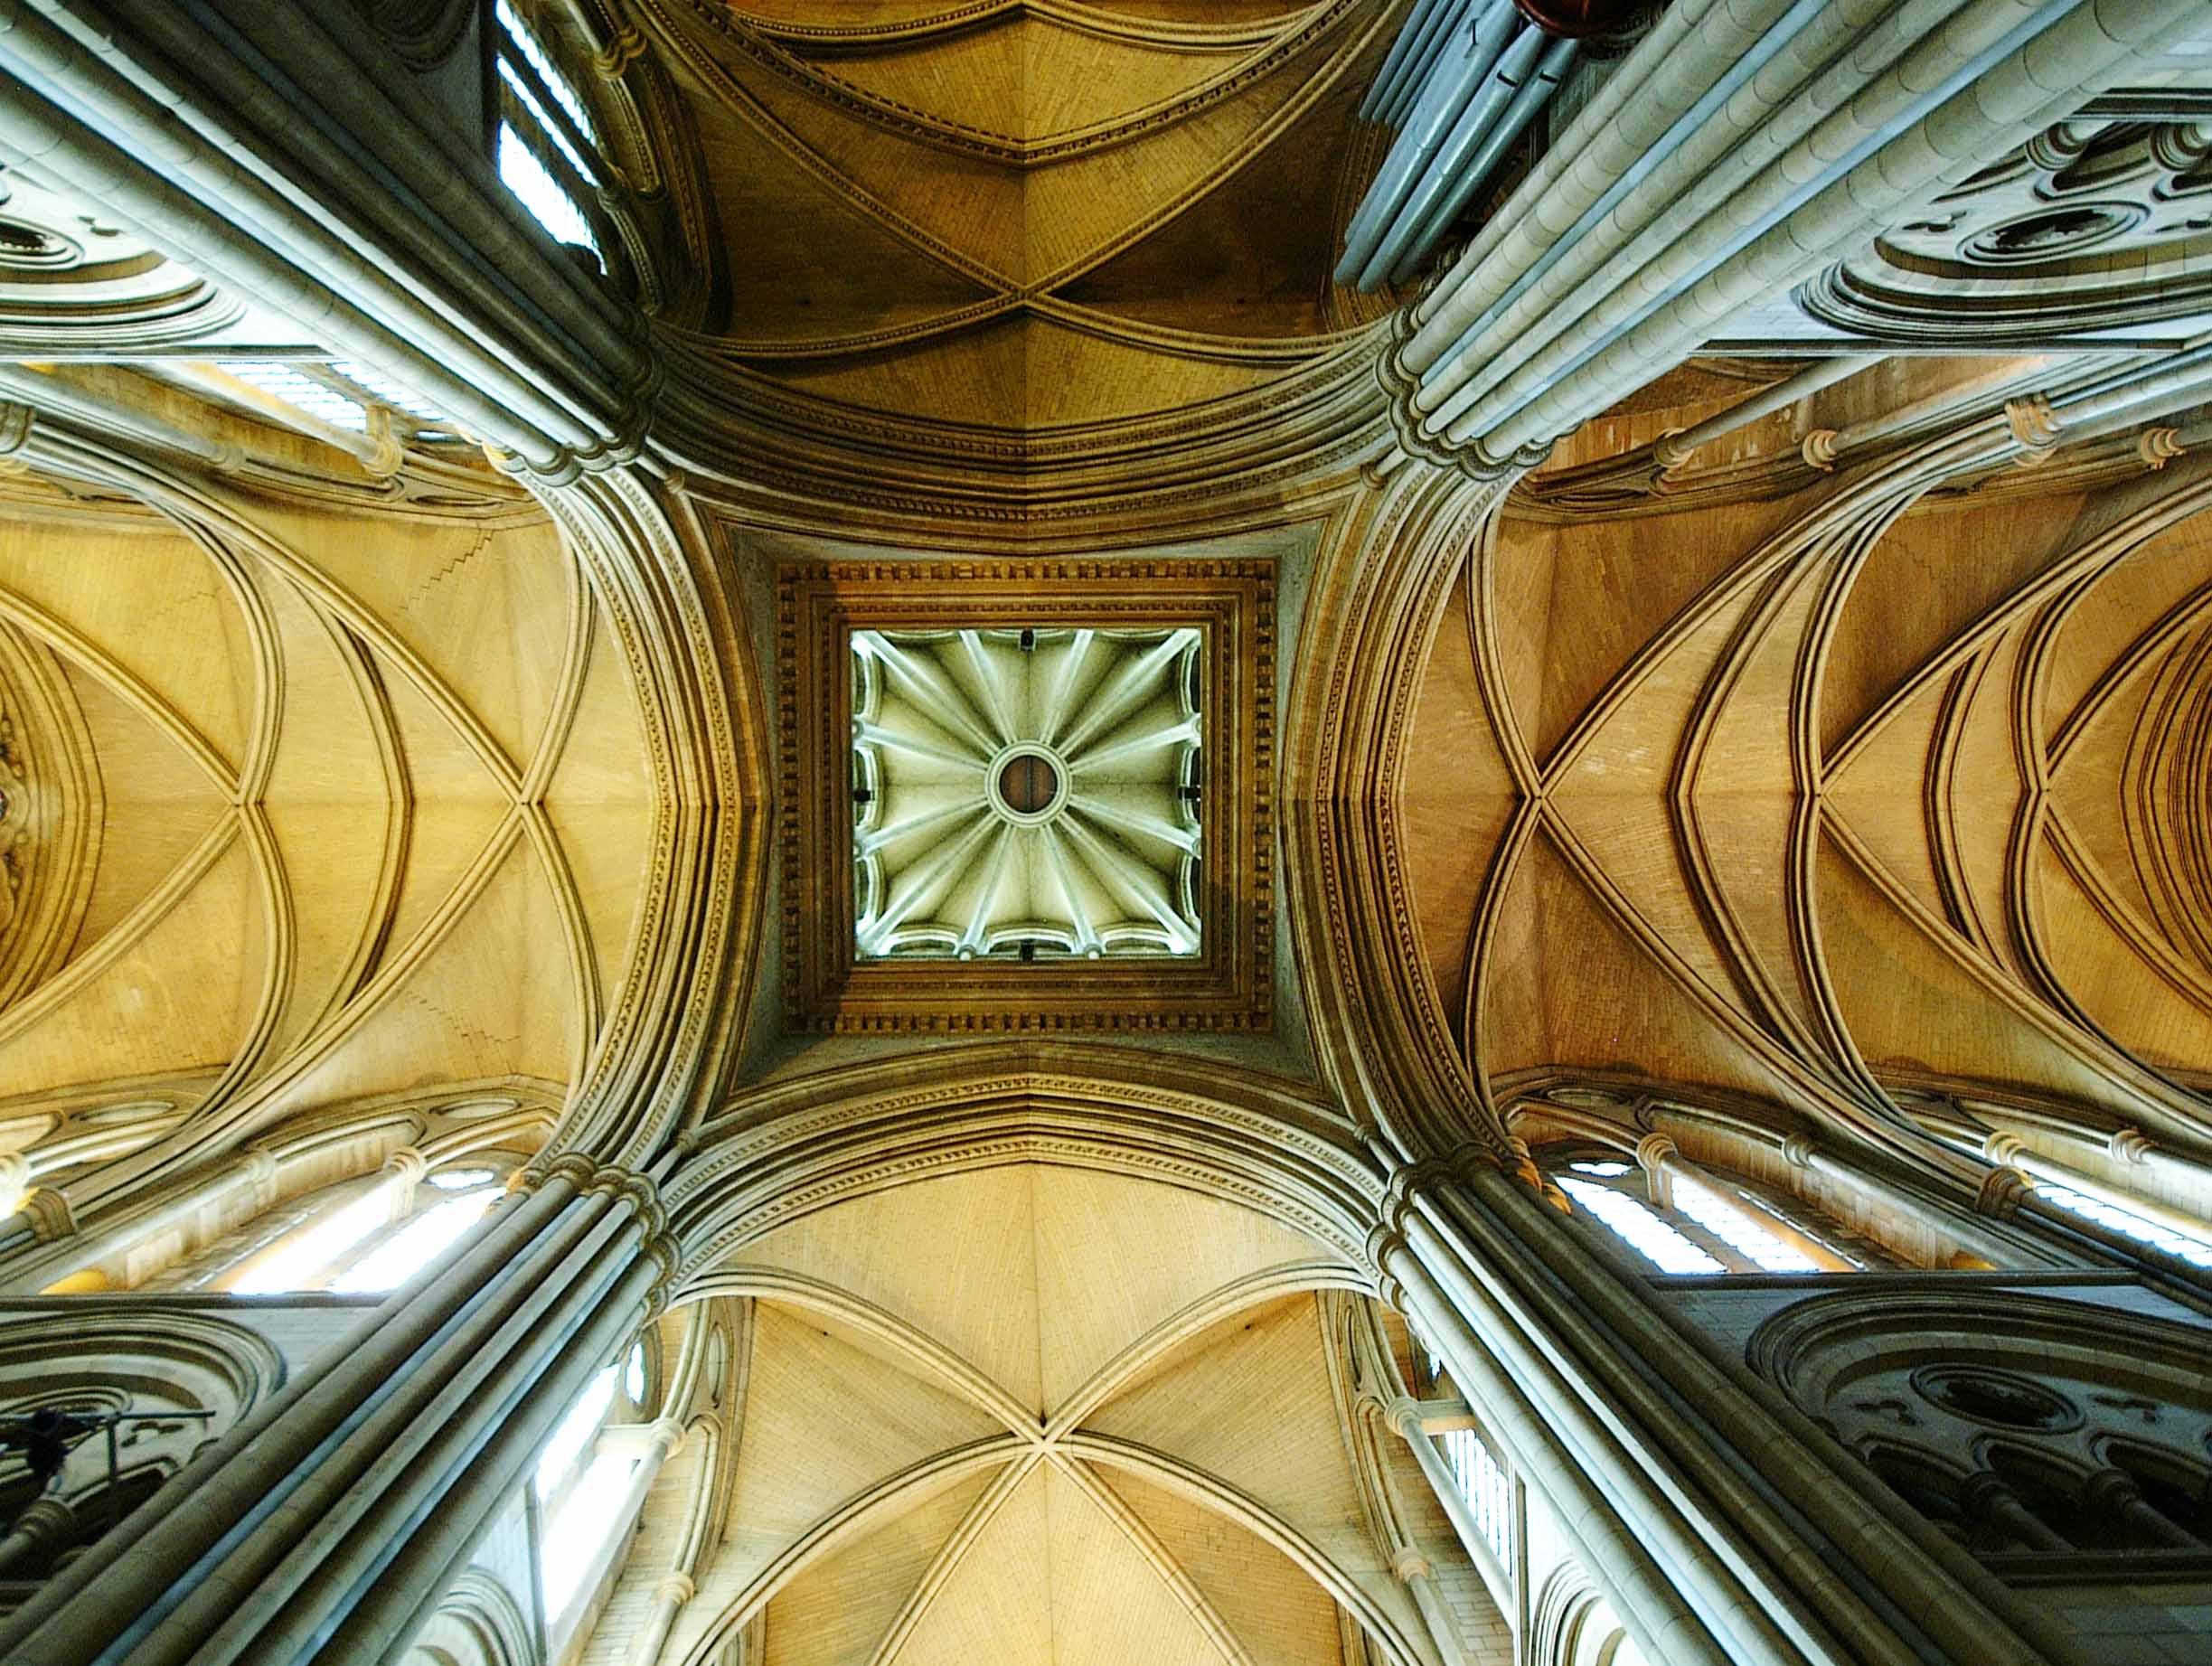 Ceiling Truro.jpg